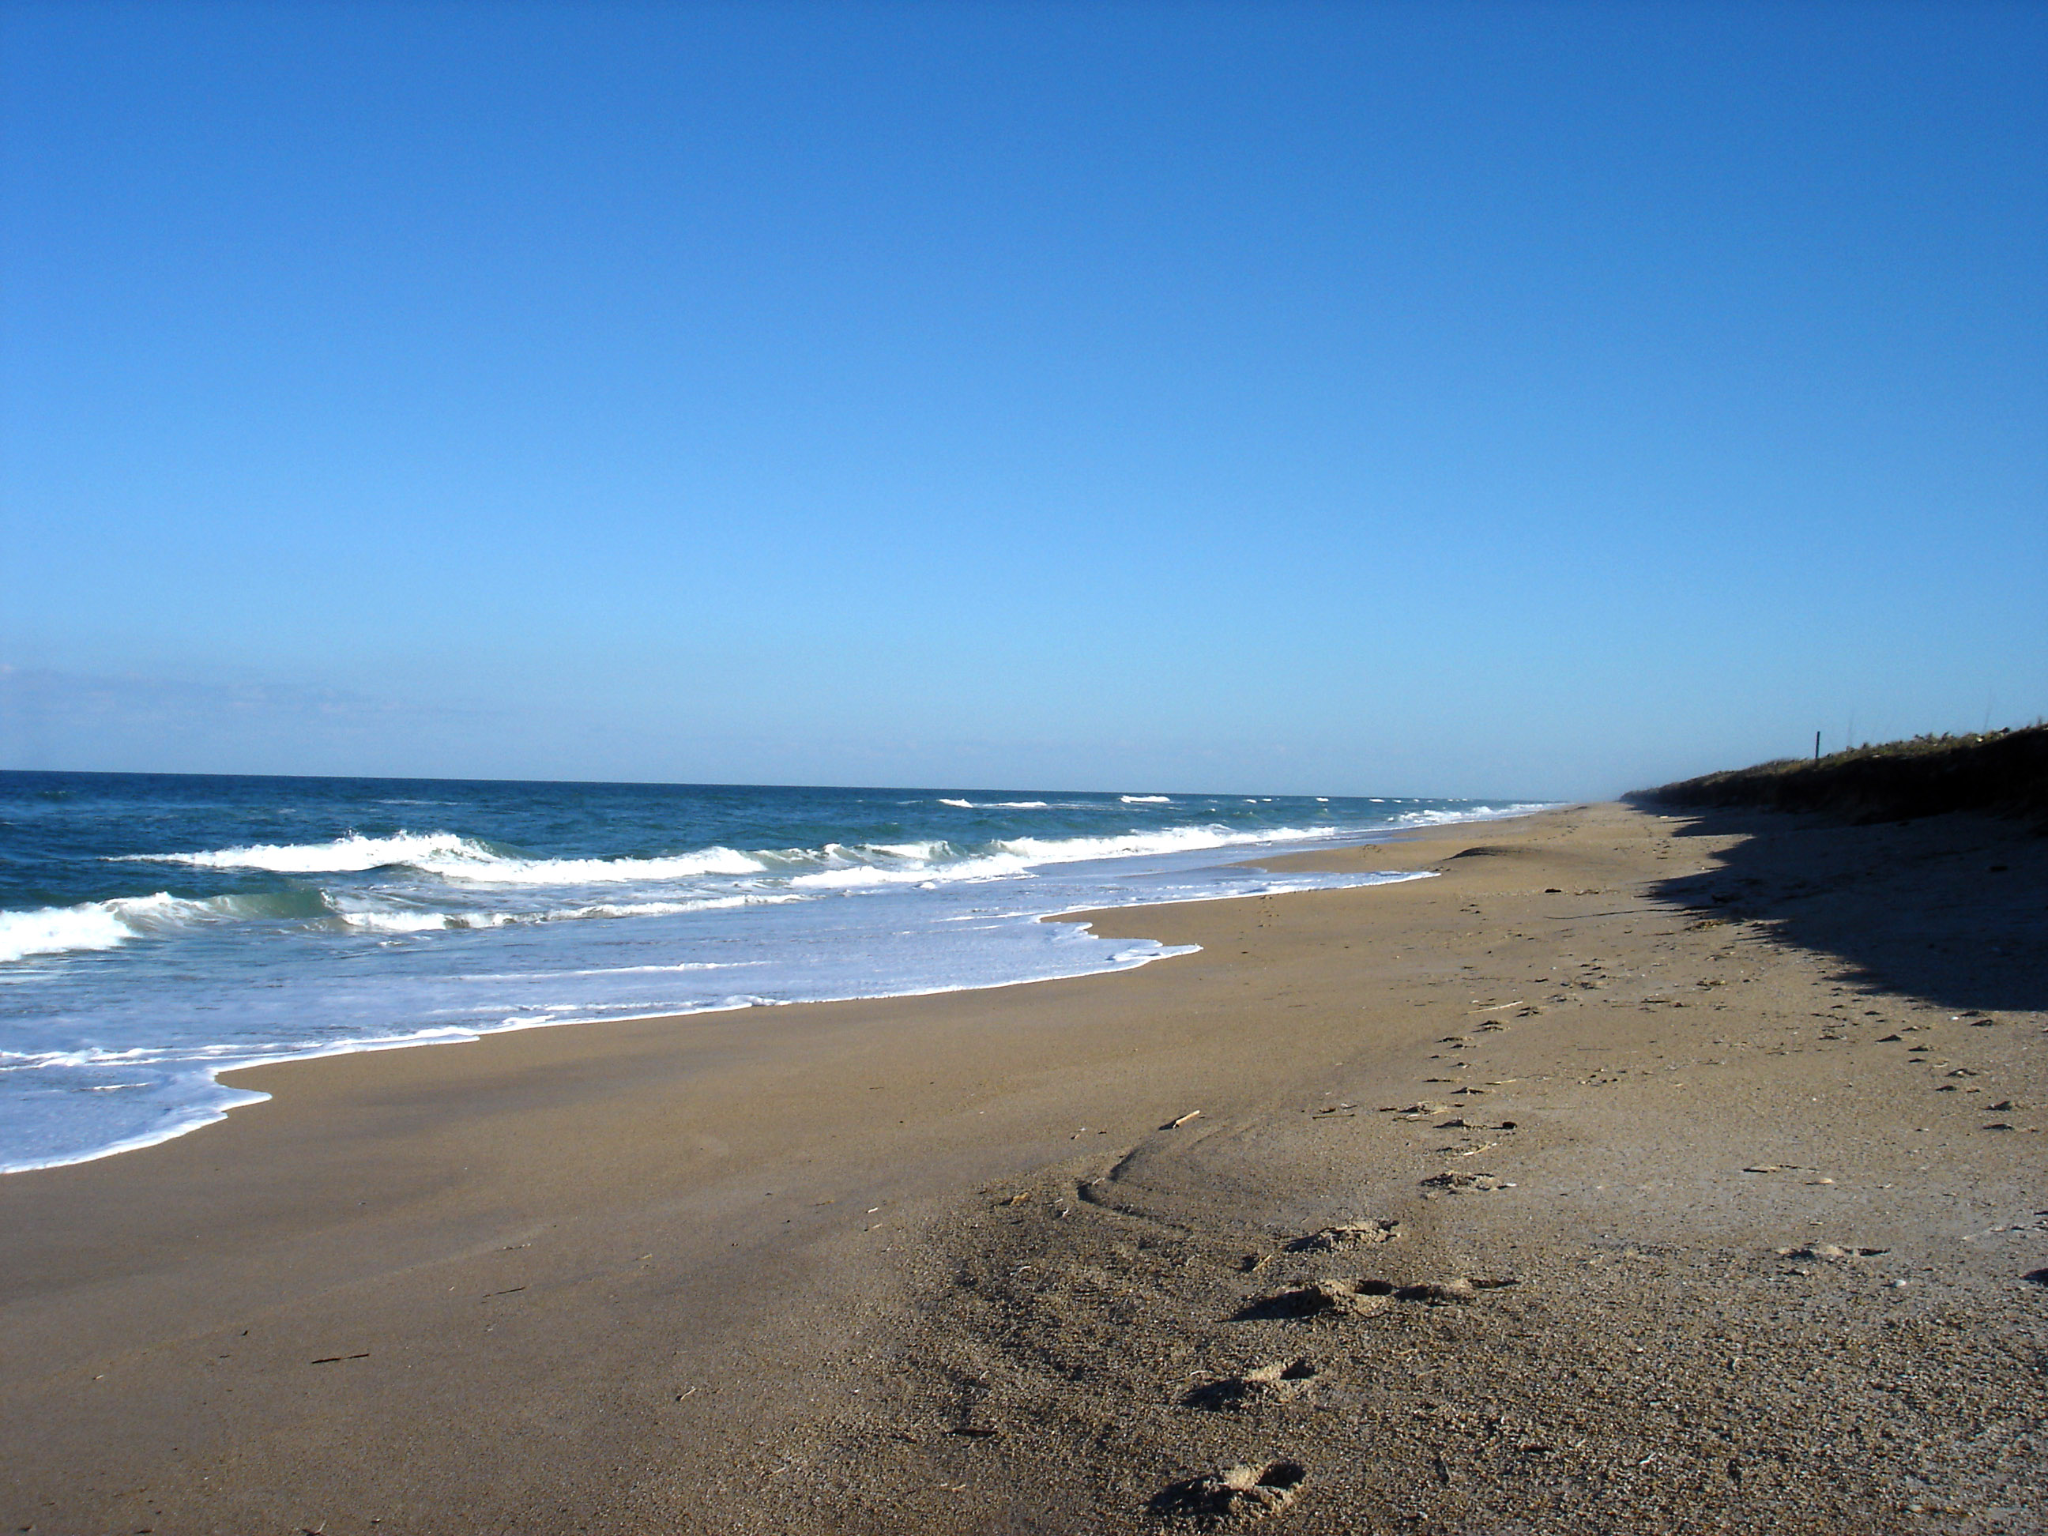 Canaveral National Seashore - East Coast Beaches